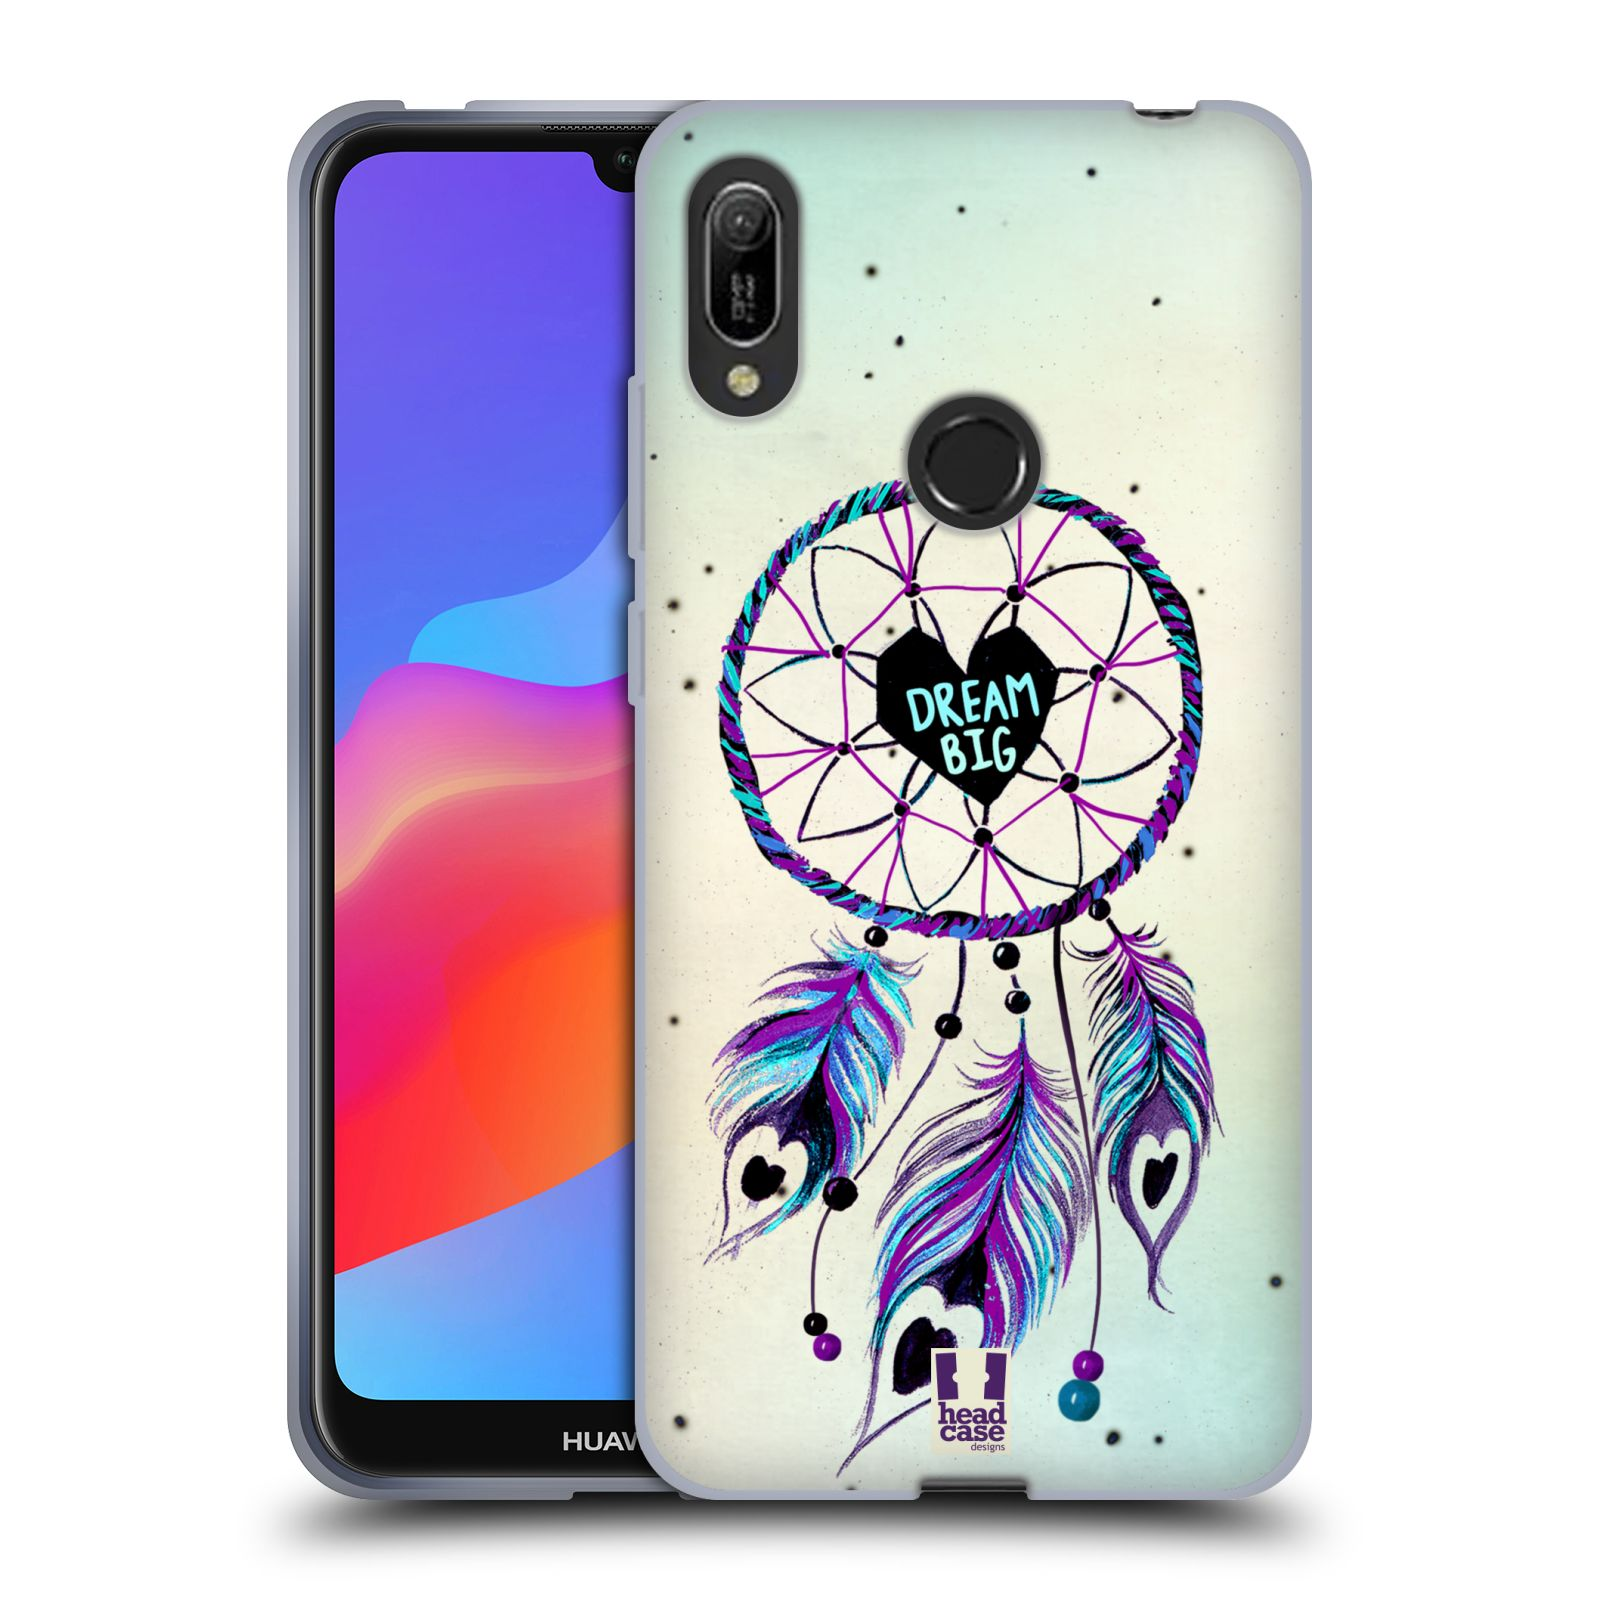 Silikonové pouzdro na mobil Huawei Y6 (2019) - Head Case - Lapač Assorted Dream Big Srdce